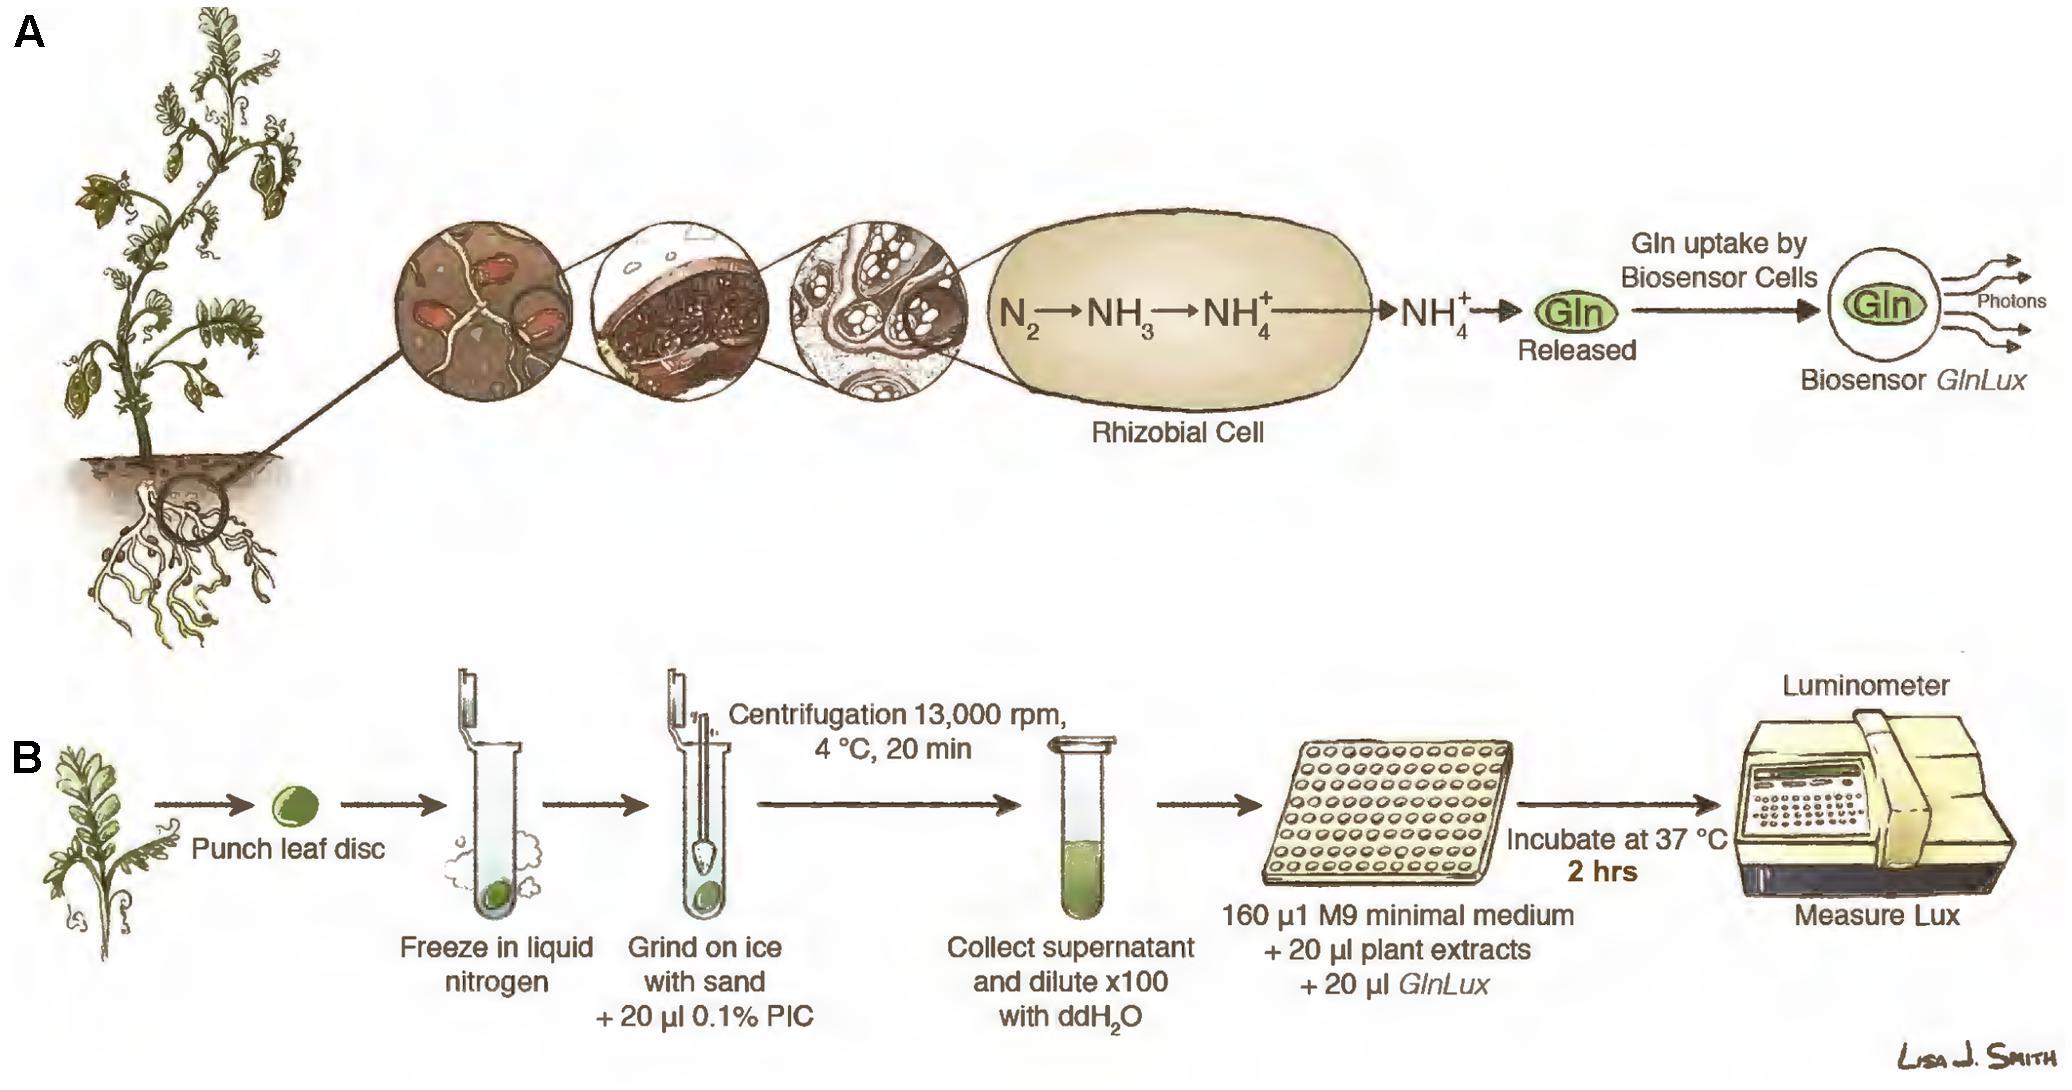 Leaf Based Glutamine FrontiersA Assay Biosensor Punch For odeCrxBW